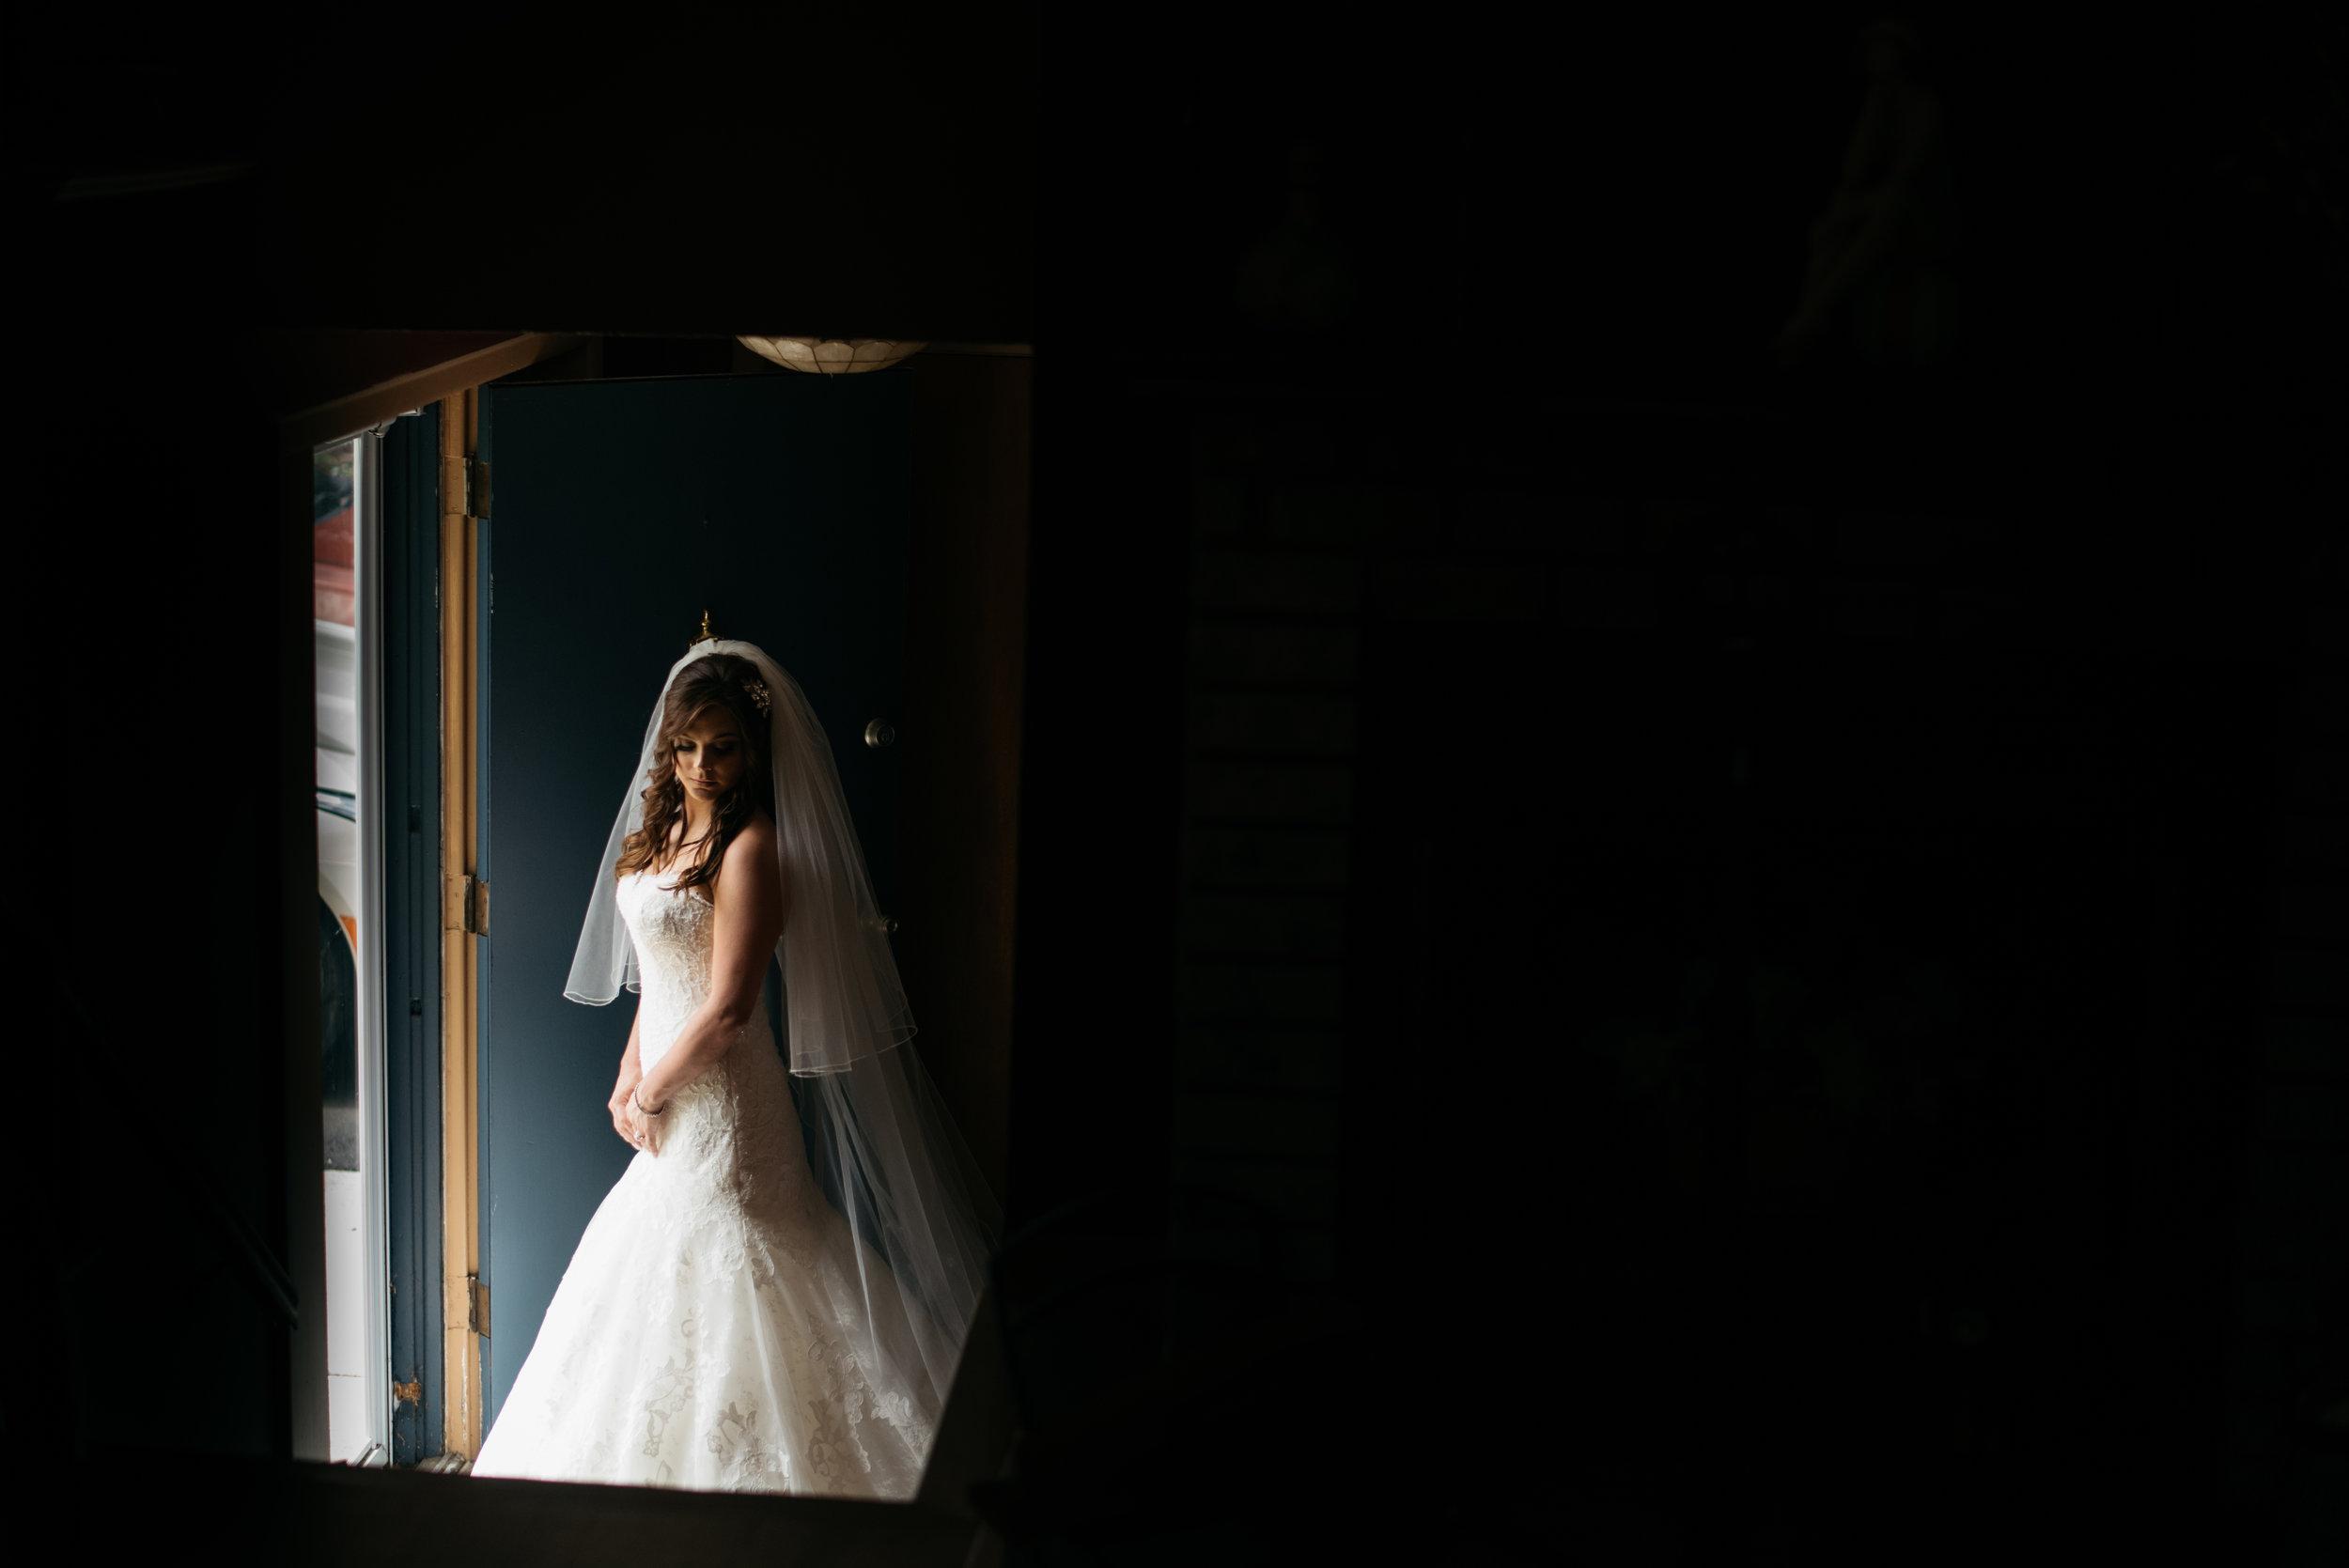 WeddingPhotos | NJPhotographer | Highlights-3-22.jpg